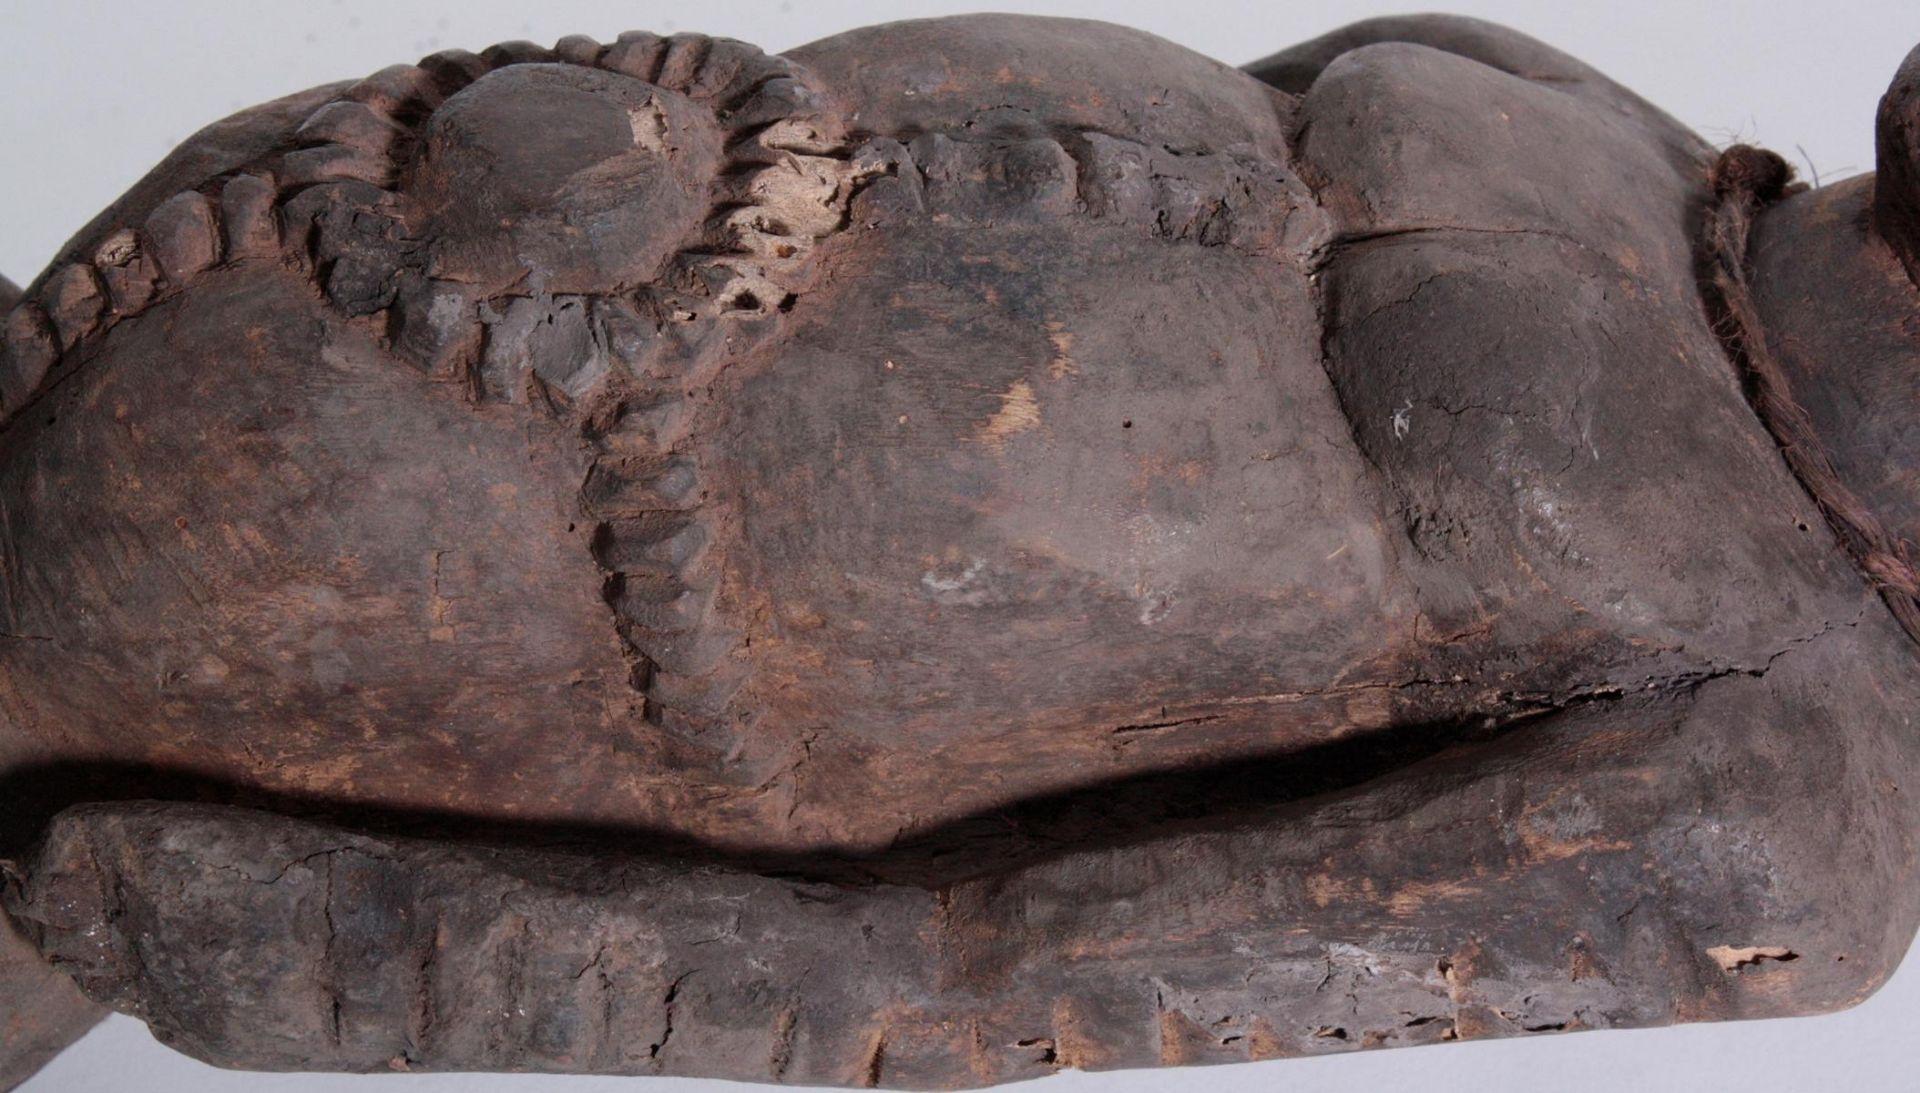 Ältere Ahnen-Figur, Tabwa, D. R. Kongo - Bild 8 aus 14